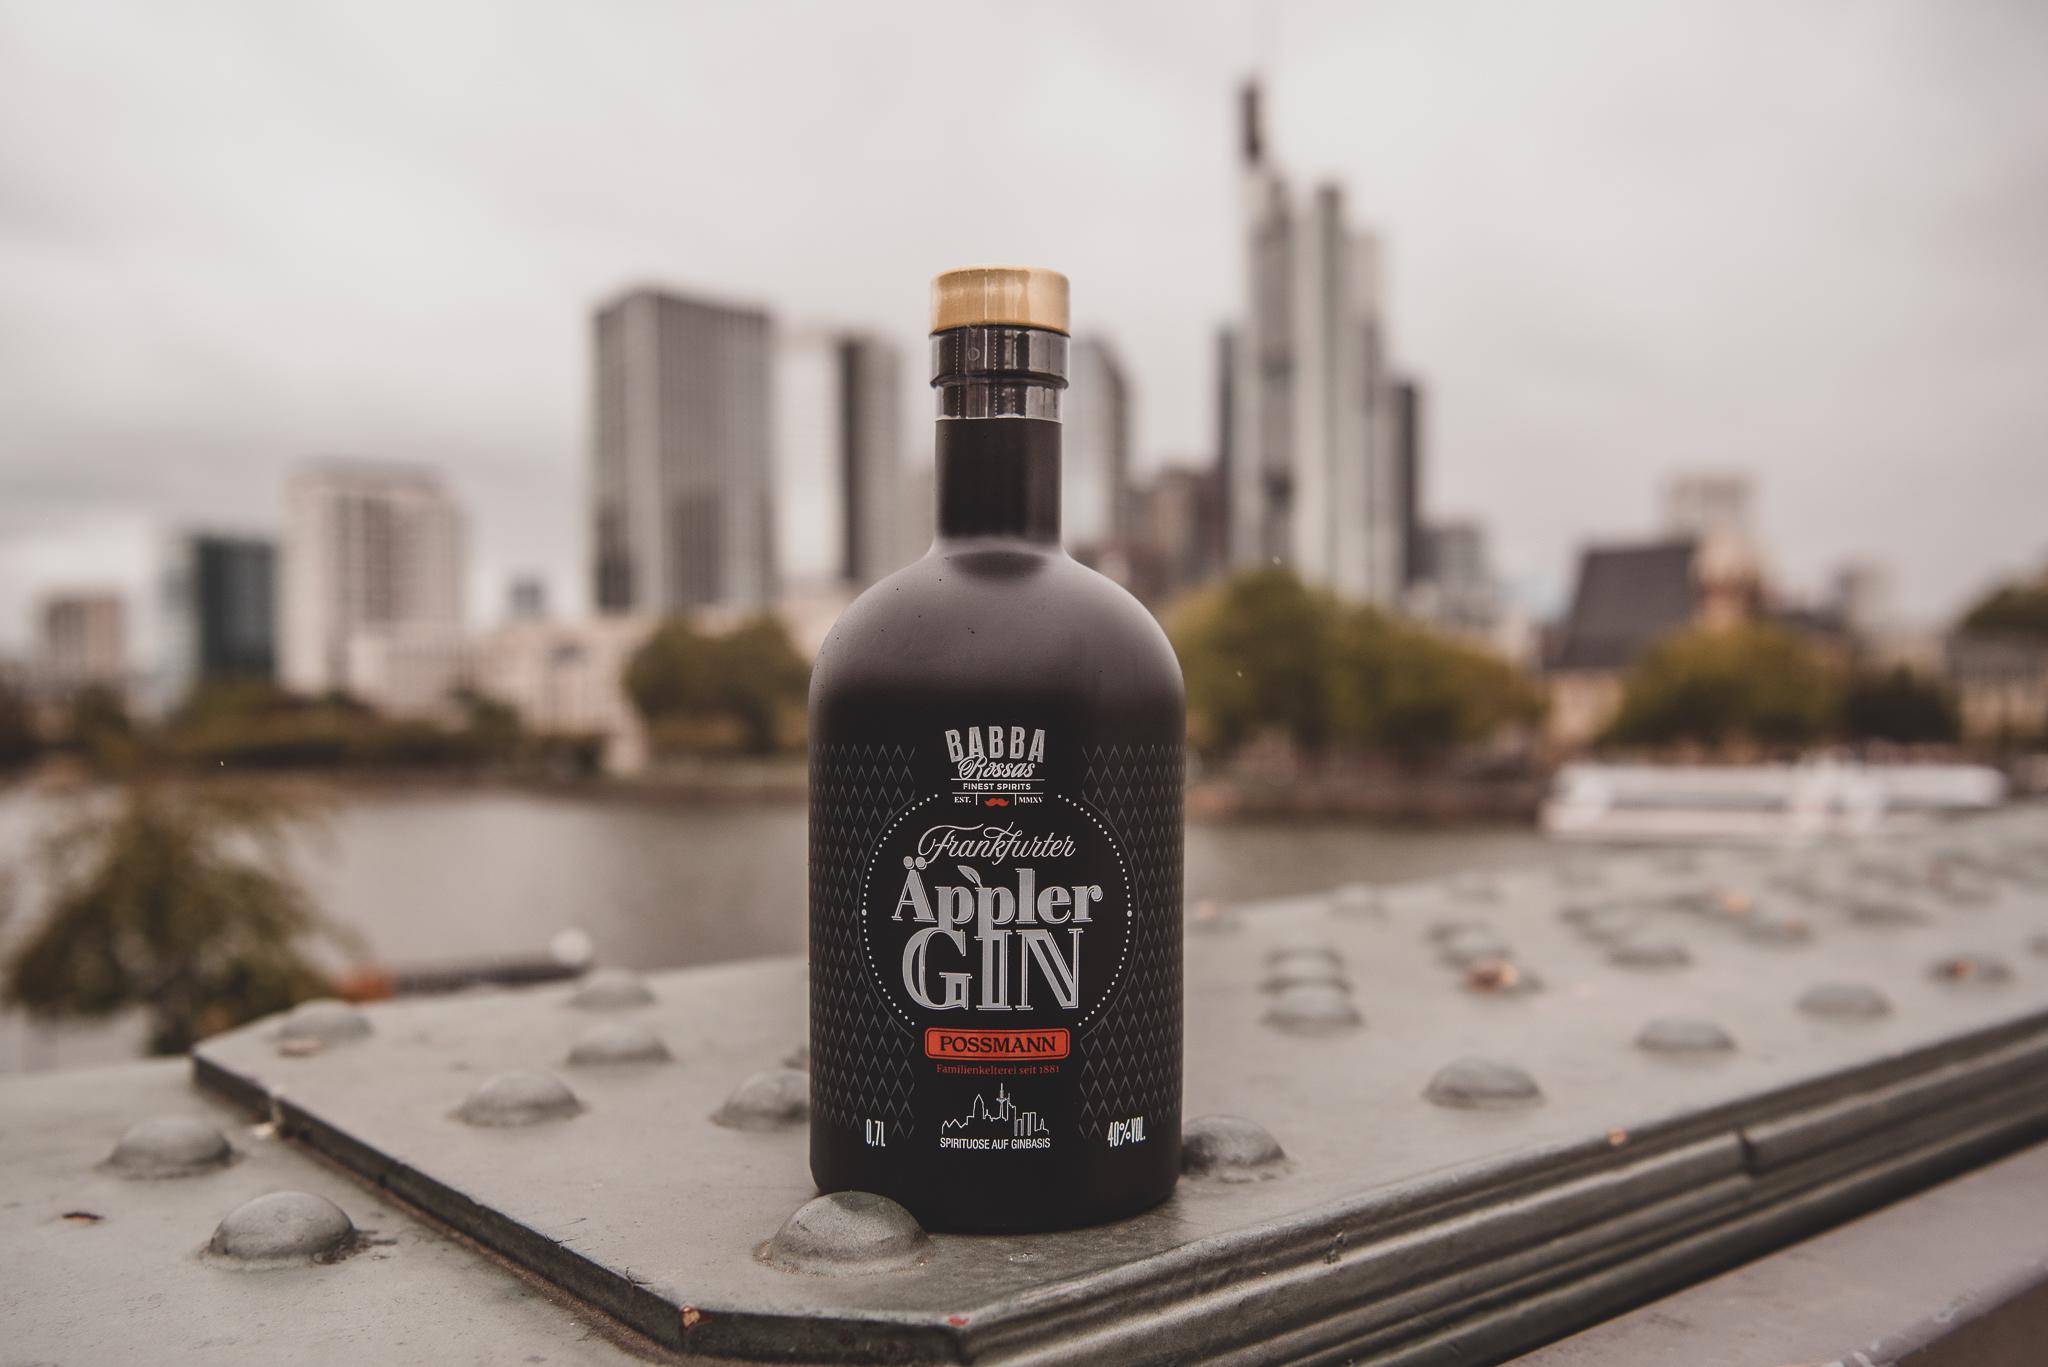 Babba Rossas Äppler Gin